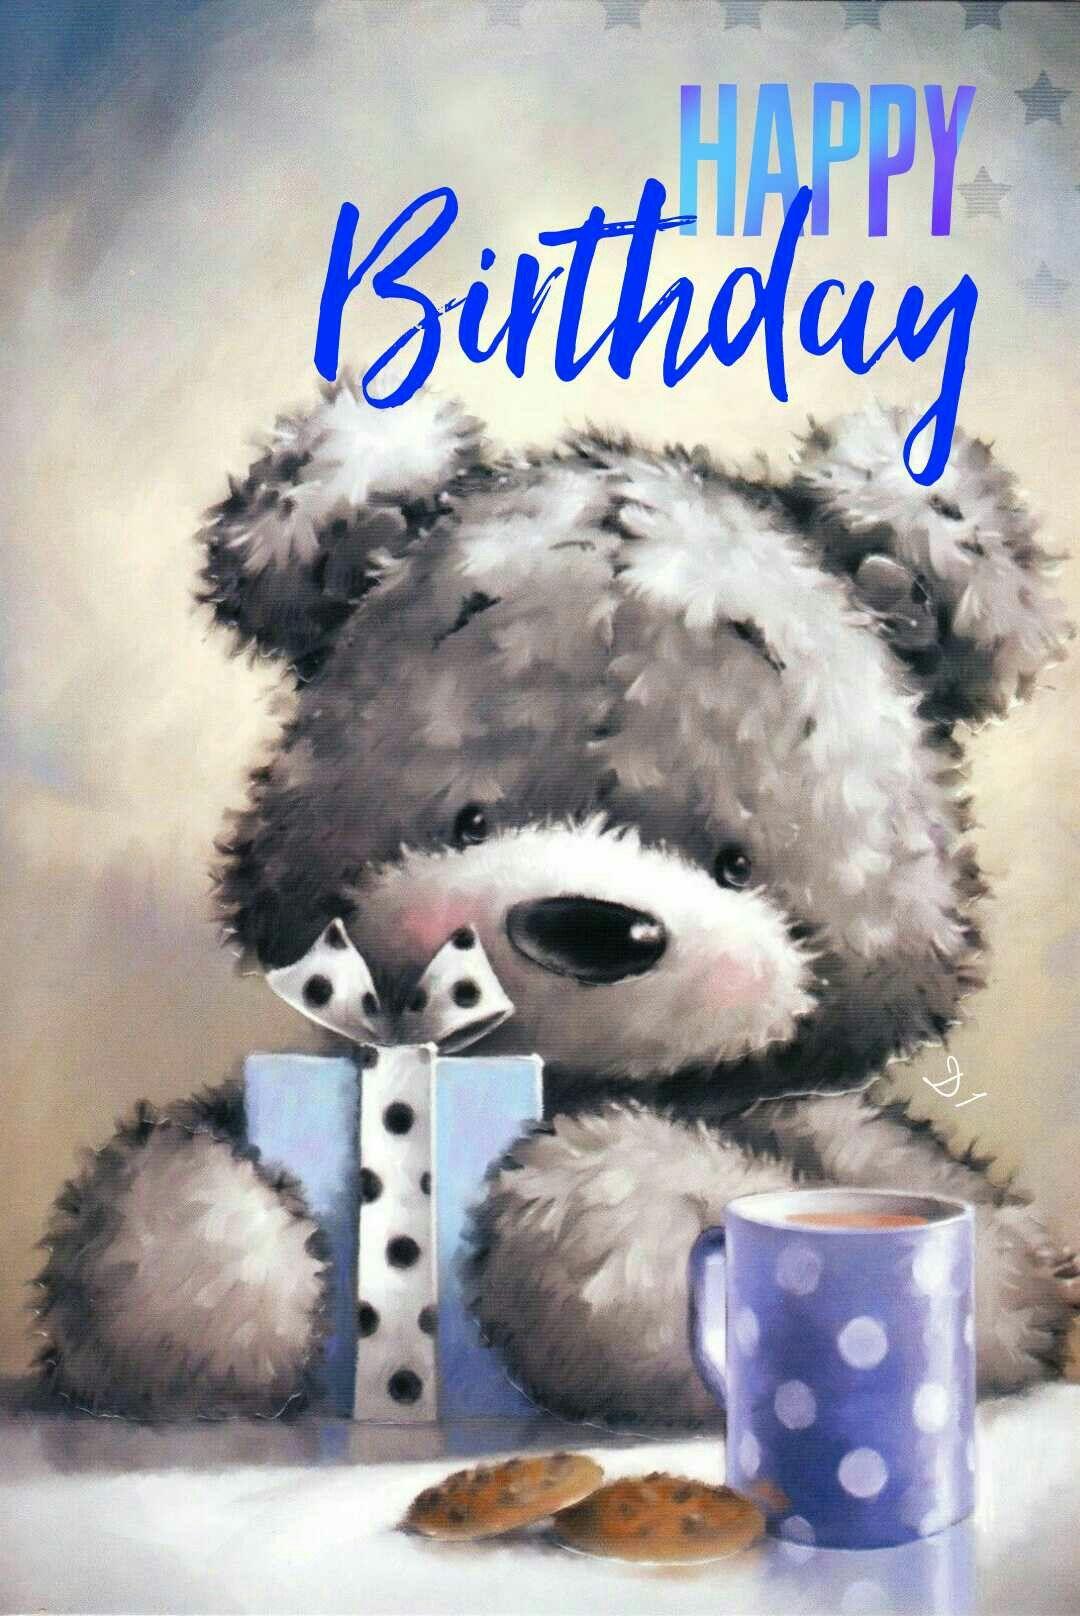 Carte Anniversaire Ourson.Happy Birthday Joyeux Anniversaire Teddy Bear Ourson Bleu